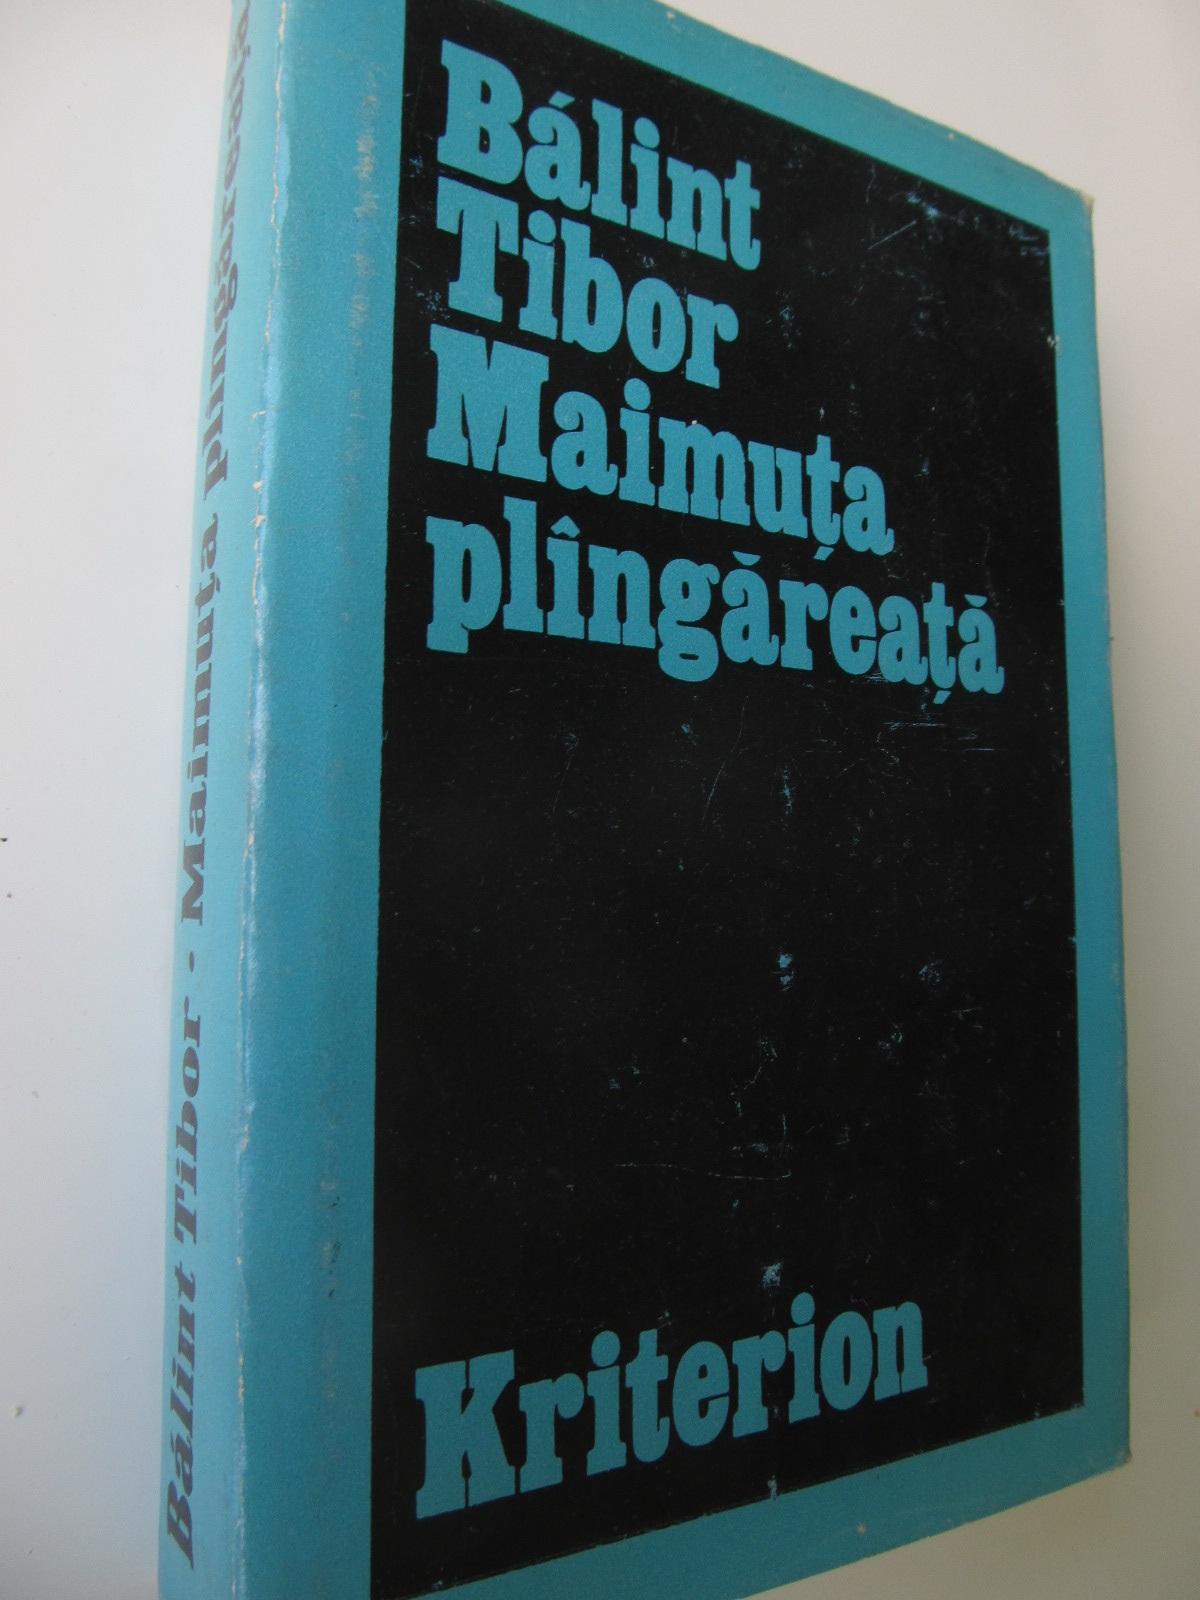 Maimuta plangareata - Balint Tibor | Detalii carte